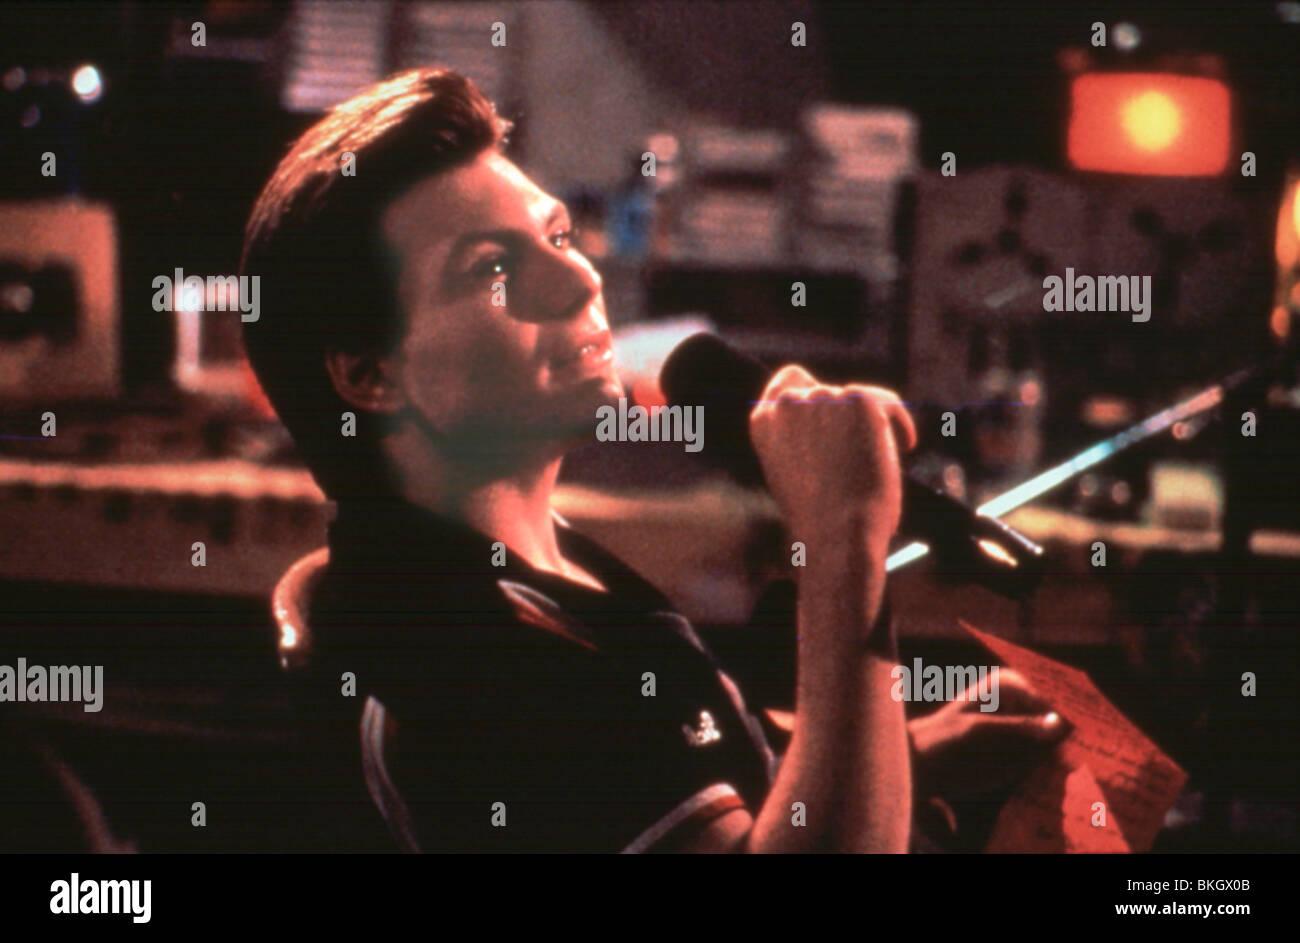 PUMP UP THE VOLUME (1990) CHRISTIAN SLATER PMV 030 - Stock Image